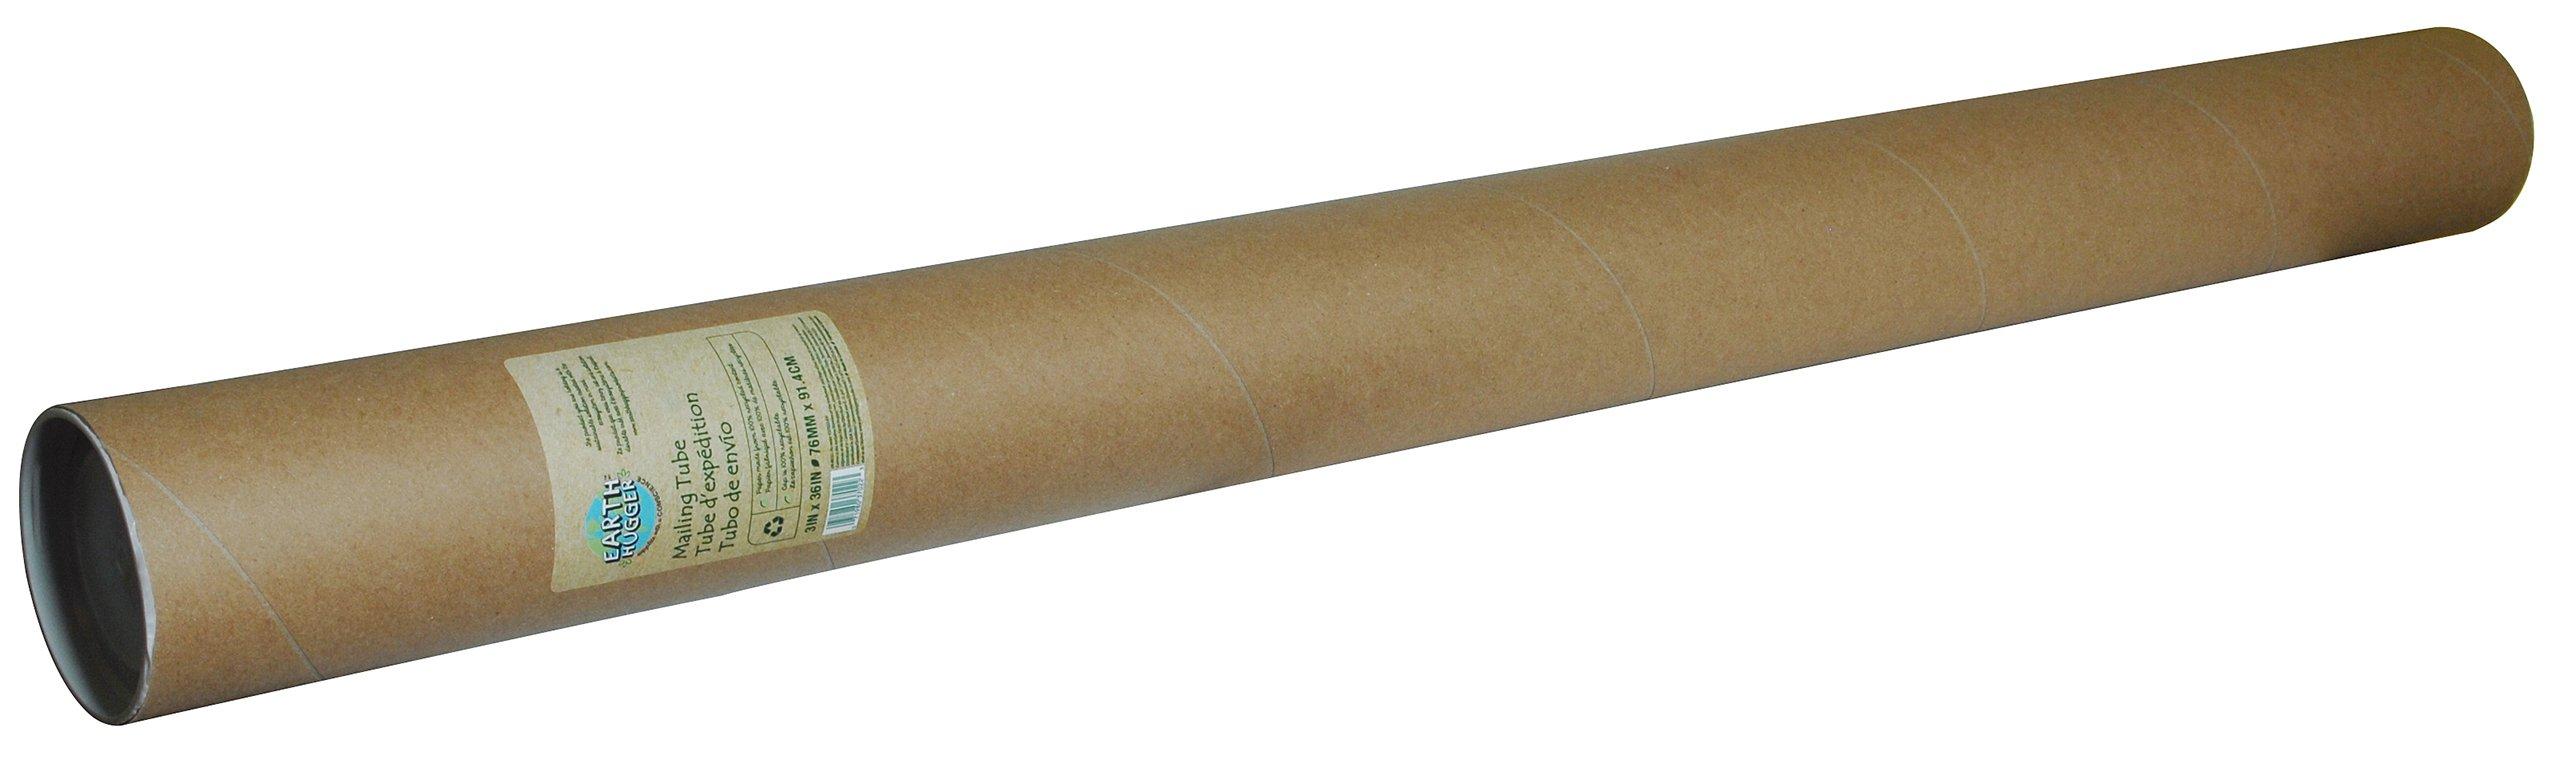 Earth Hugger 3'' x 36'' Mailing Tube, 12 Pack (37022-EH) by Earth Hugger